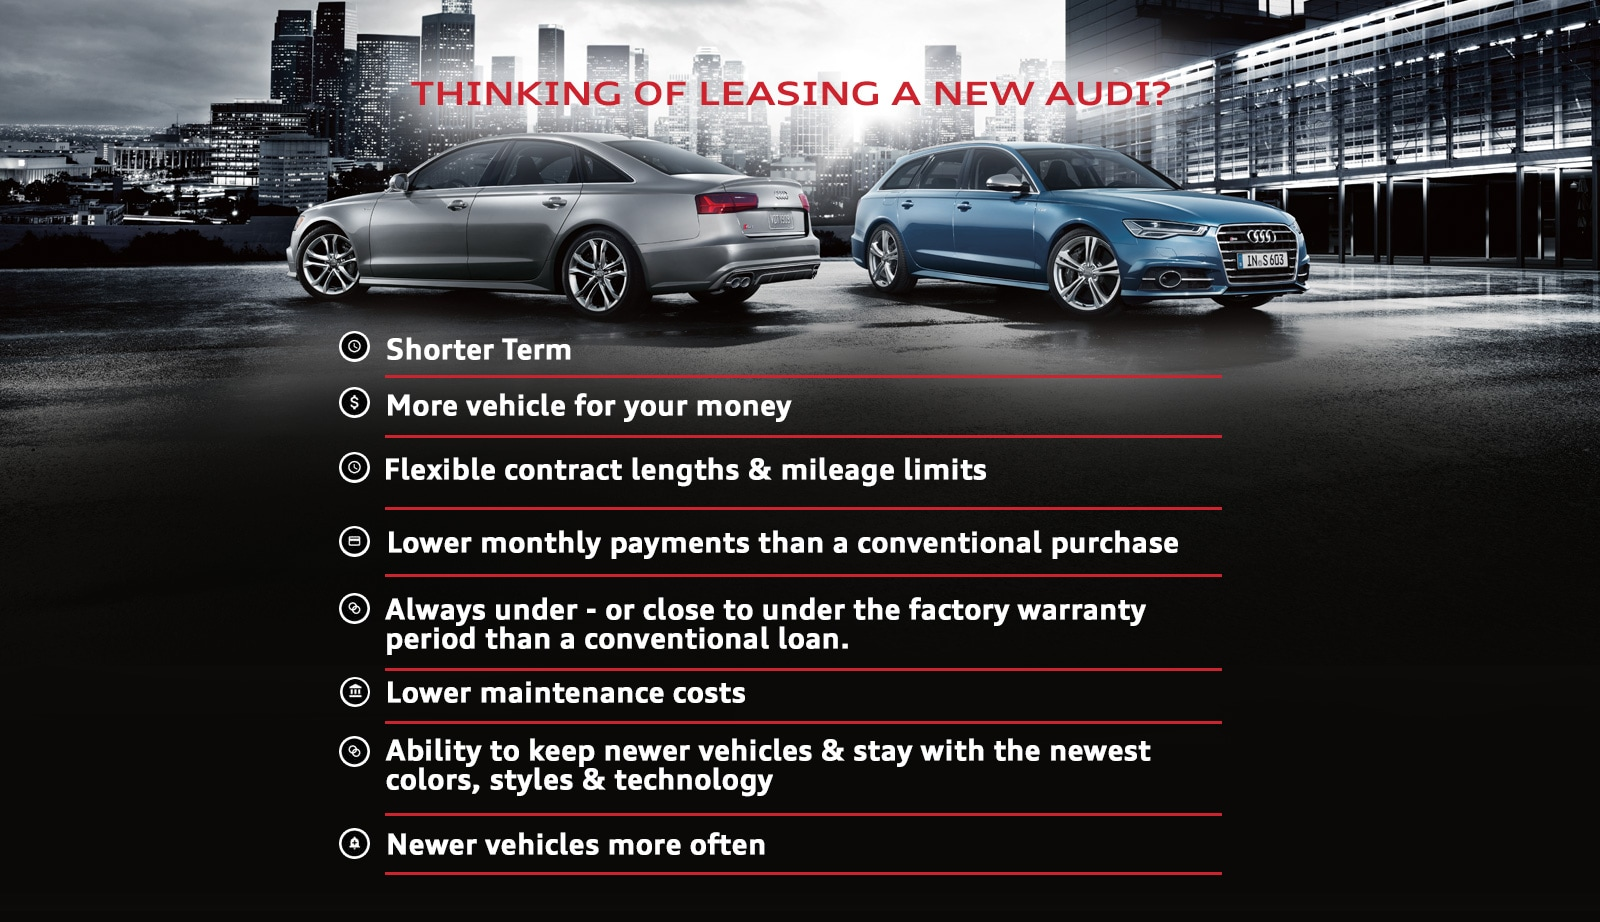 leasing htm brentwood nashville audi options an tn return lease you